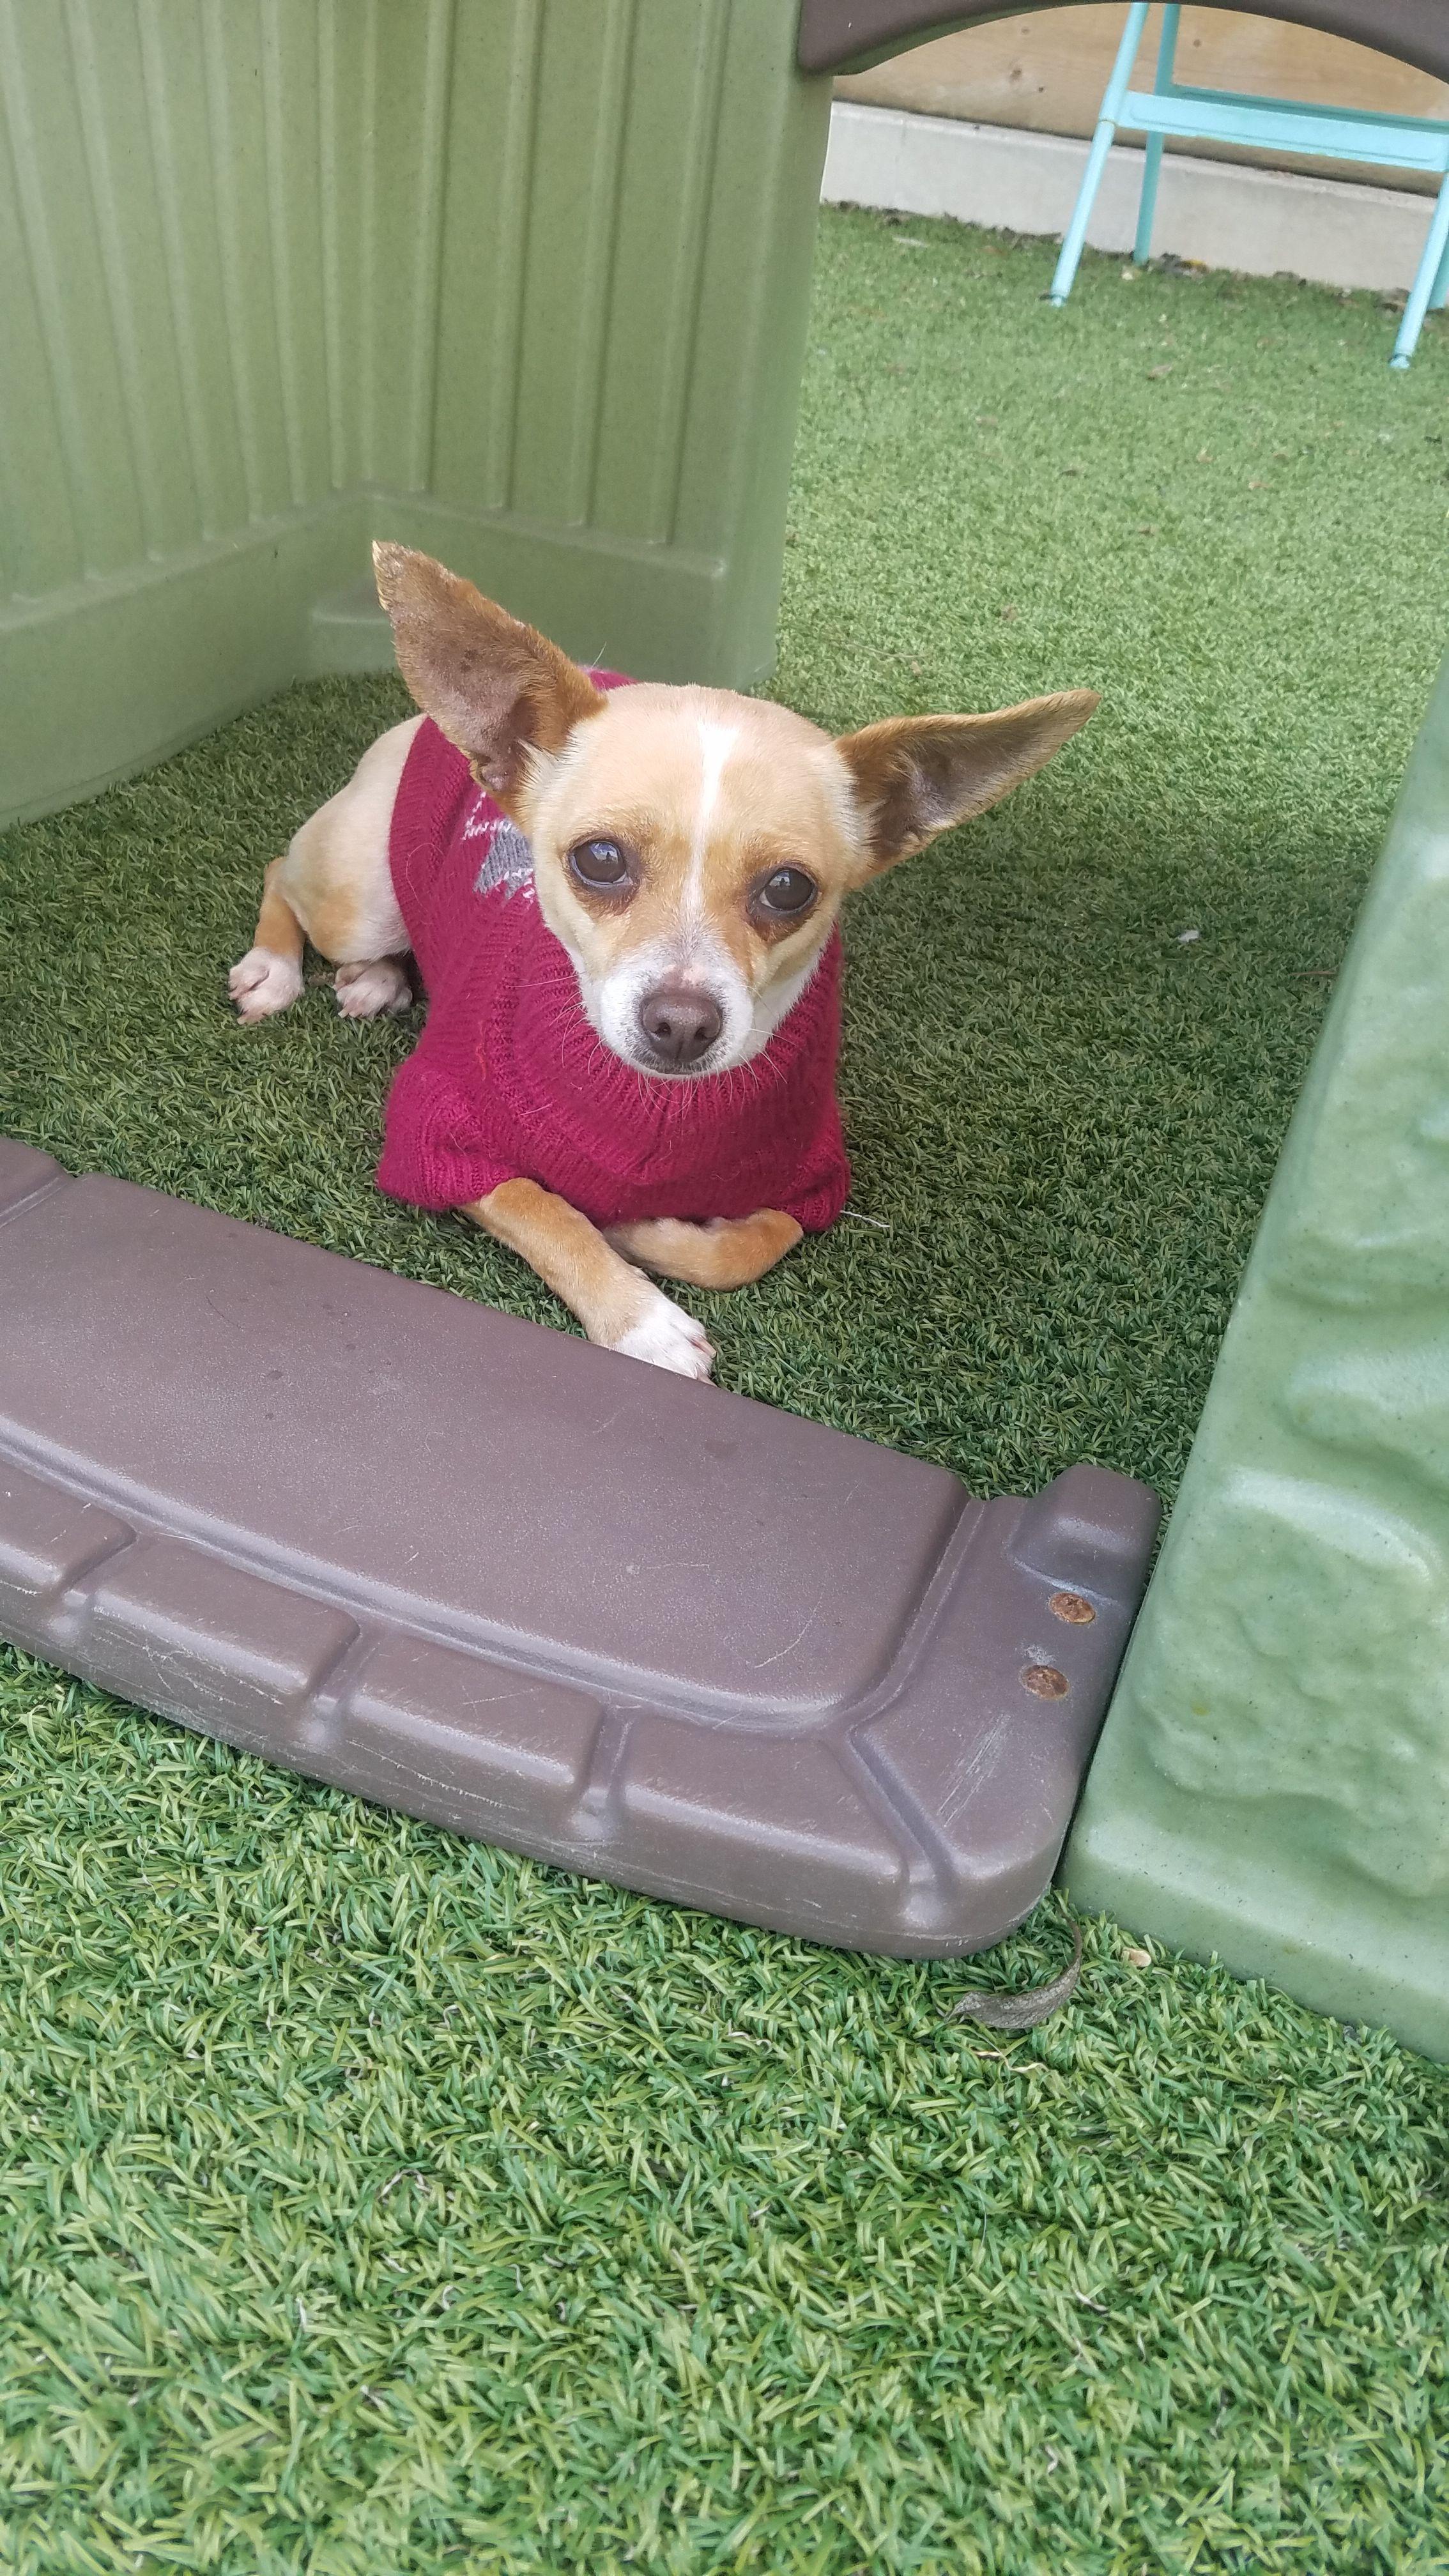 Chihuahua dog for Adoption in San Francisco, CA. ADN